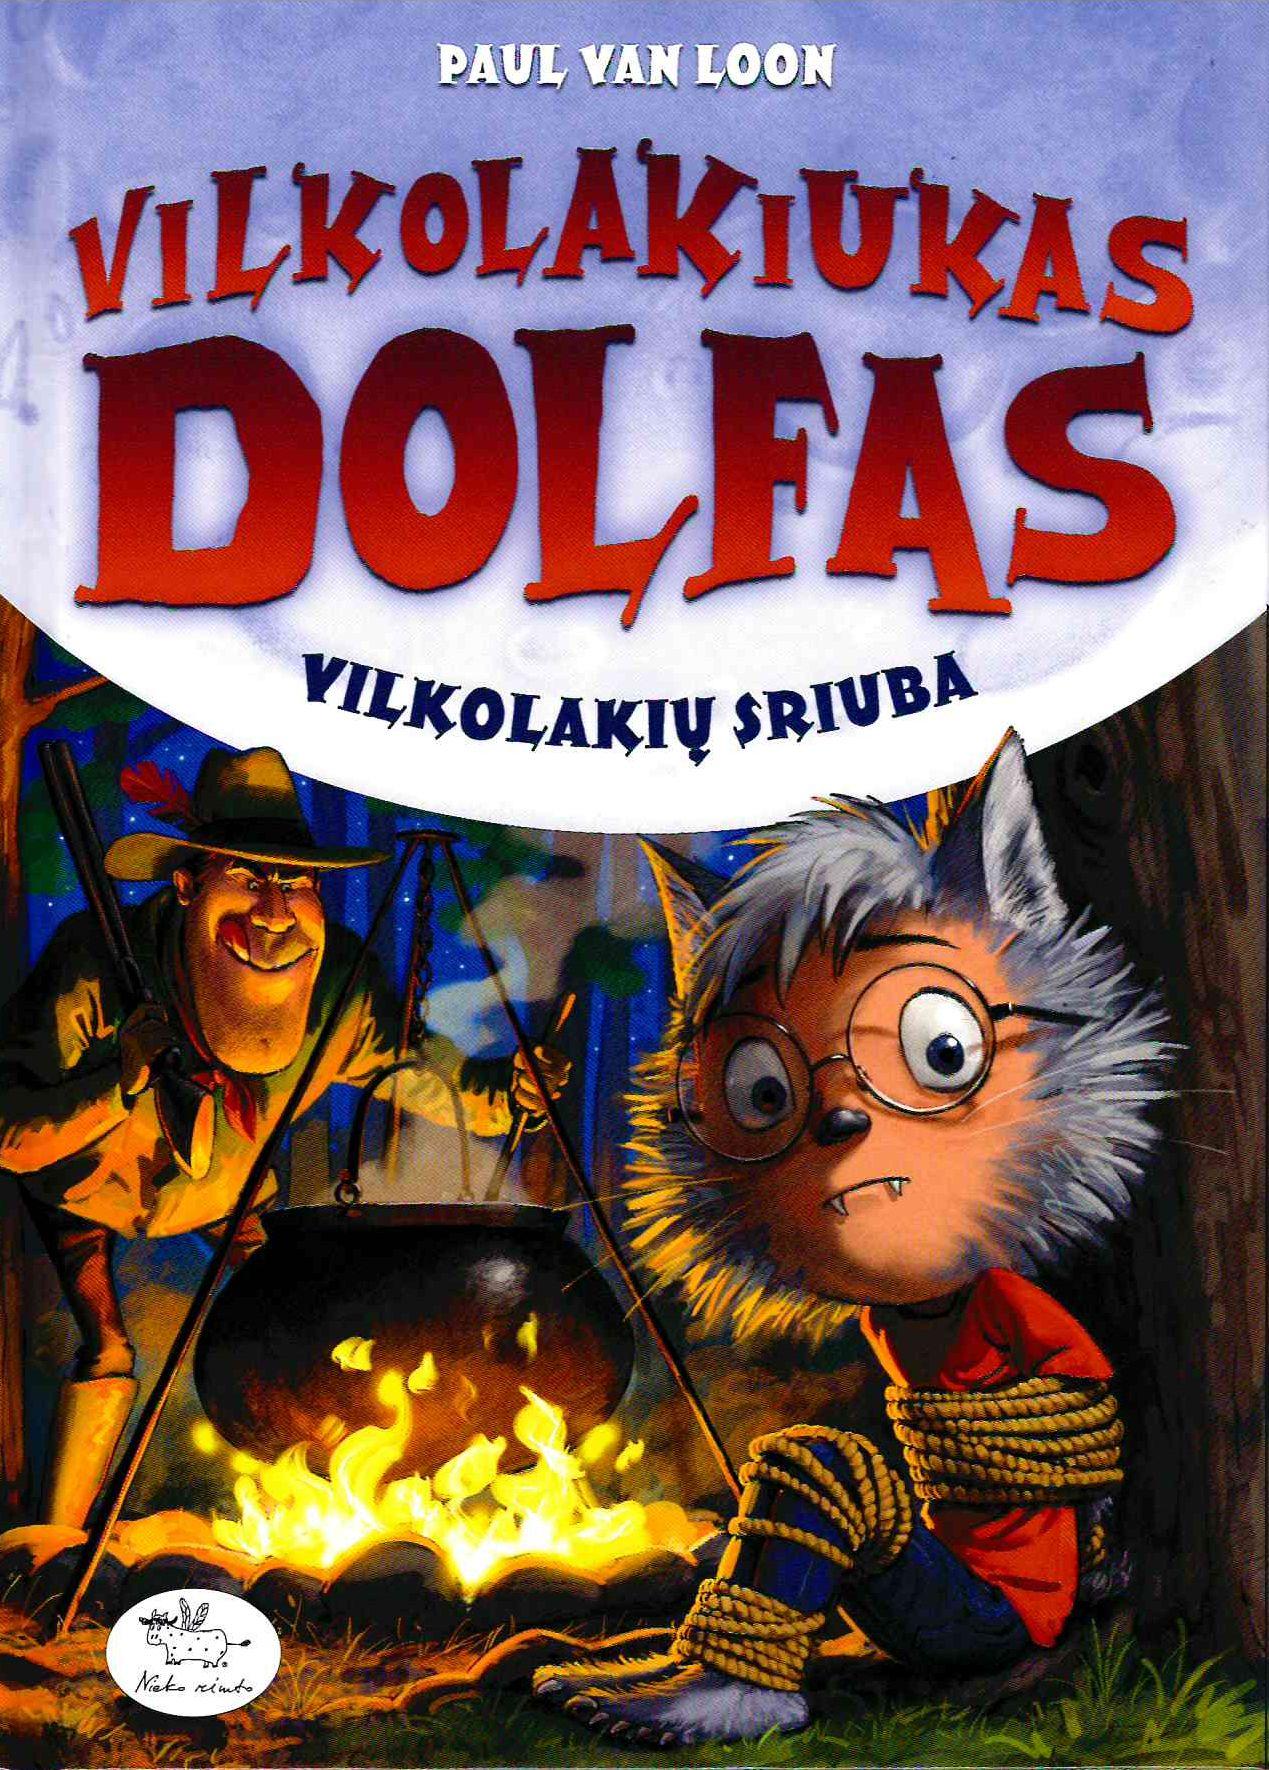 Vlkolakiukas Dolfas. Vilkolakių sriuba